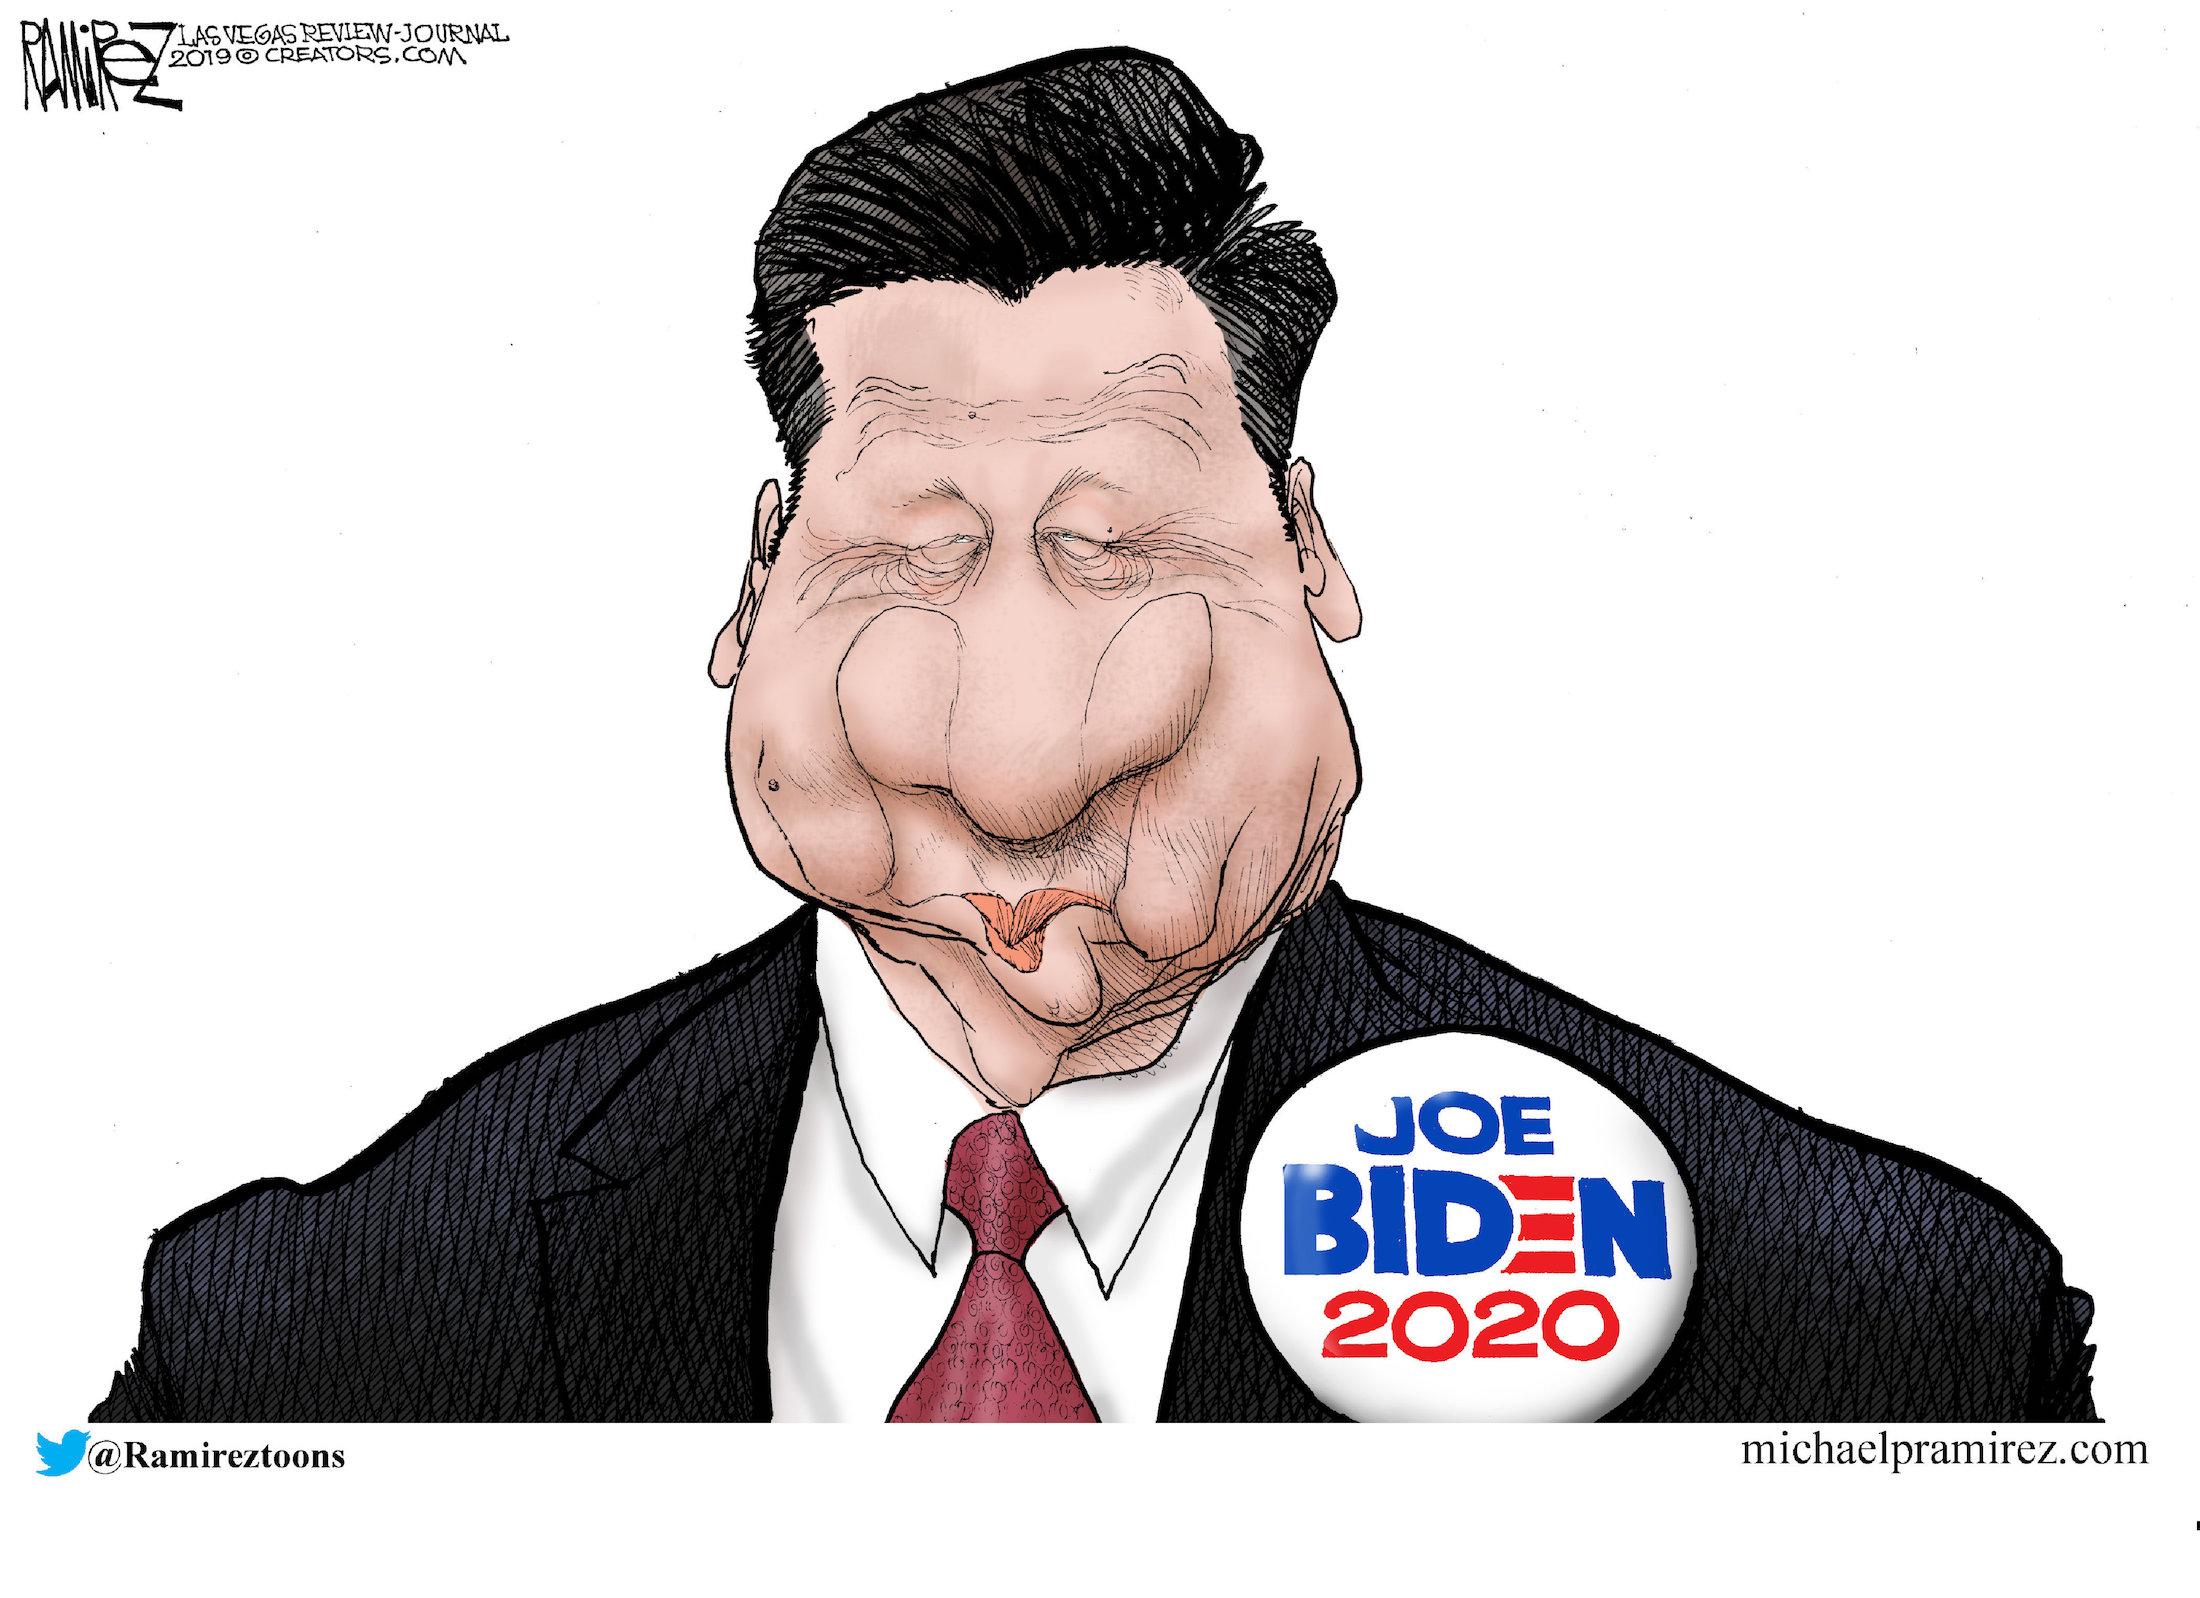 Political Cartoons Campaigns And Elections Joe Biden 2020 Washington Times